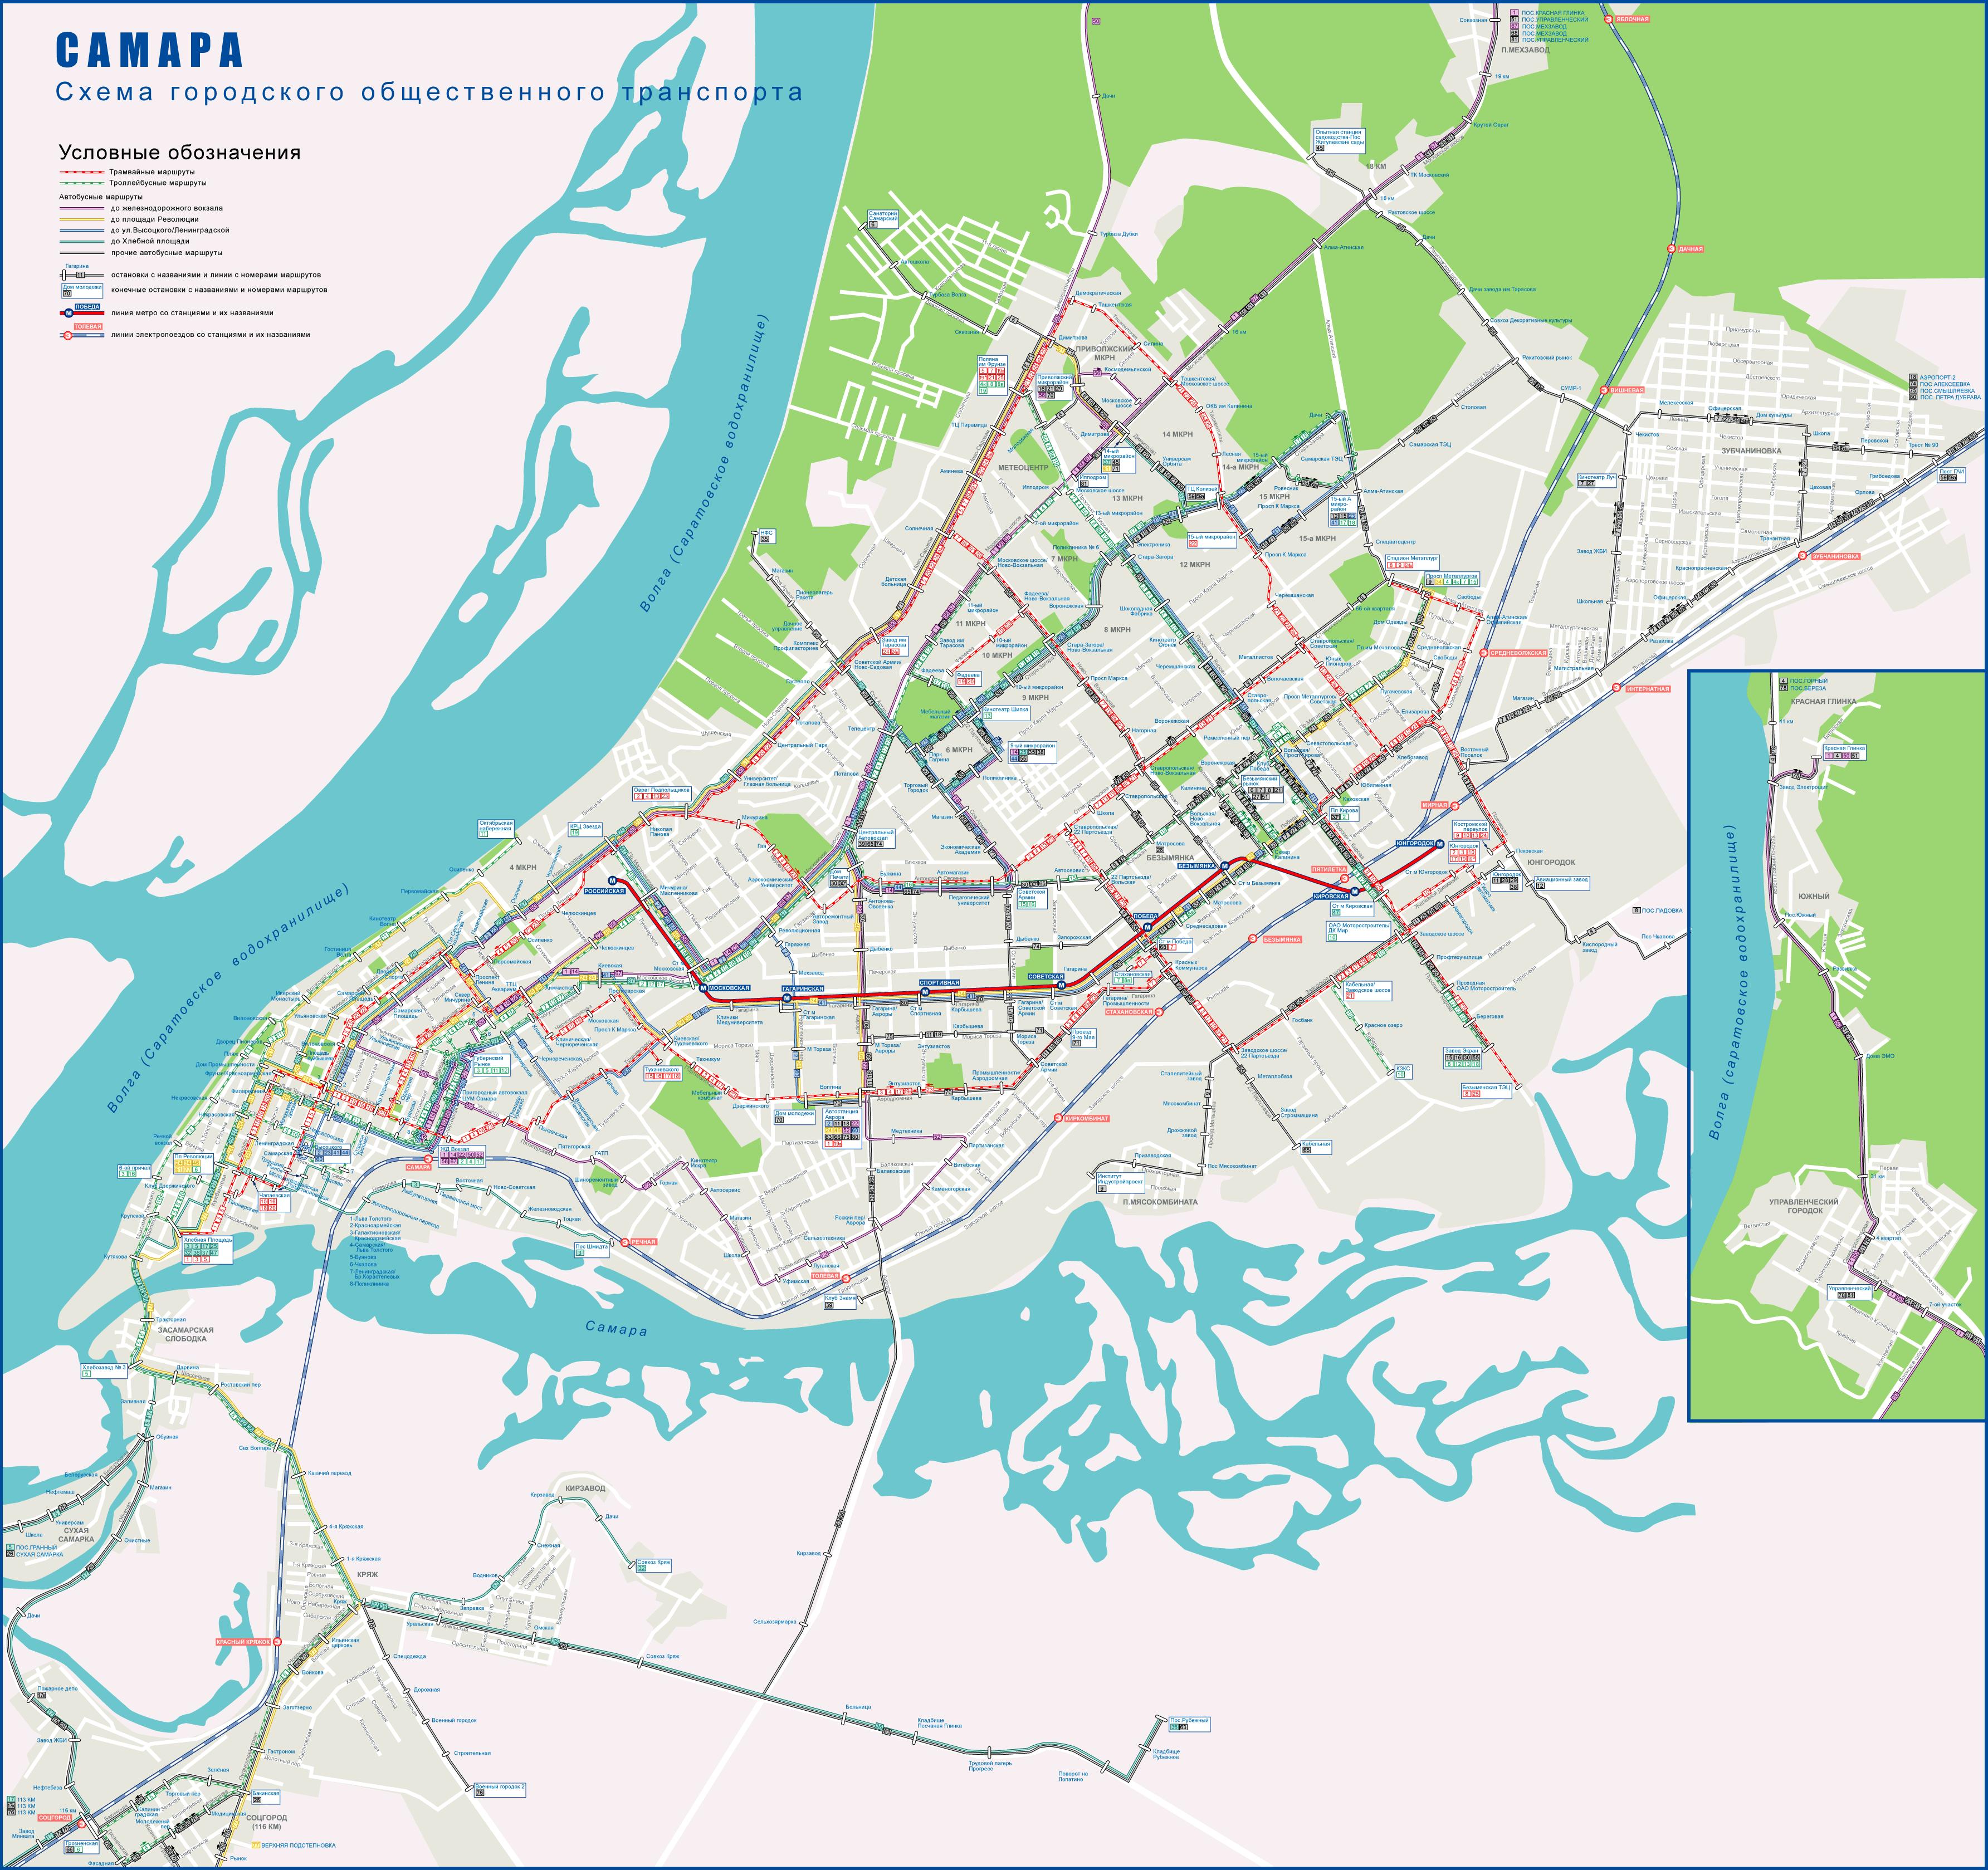 трамвай иркутск схема